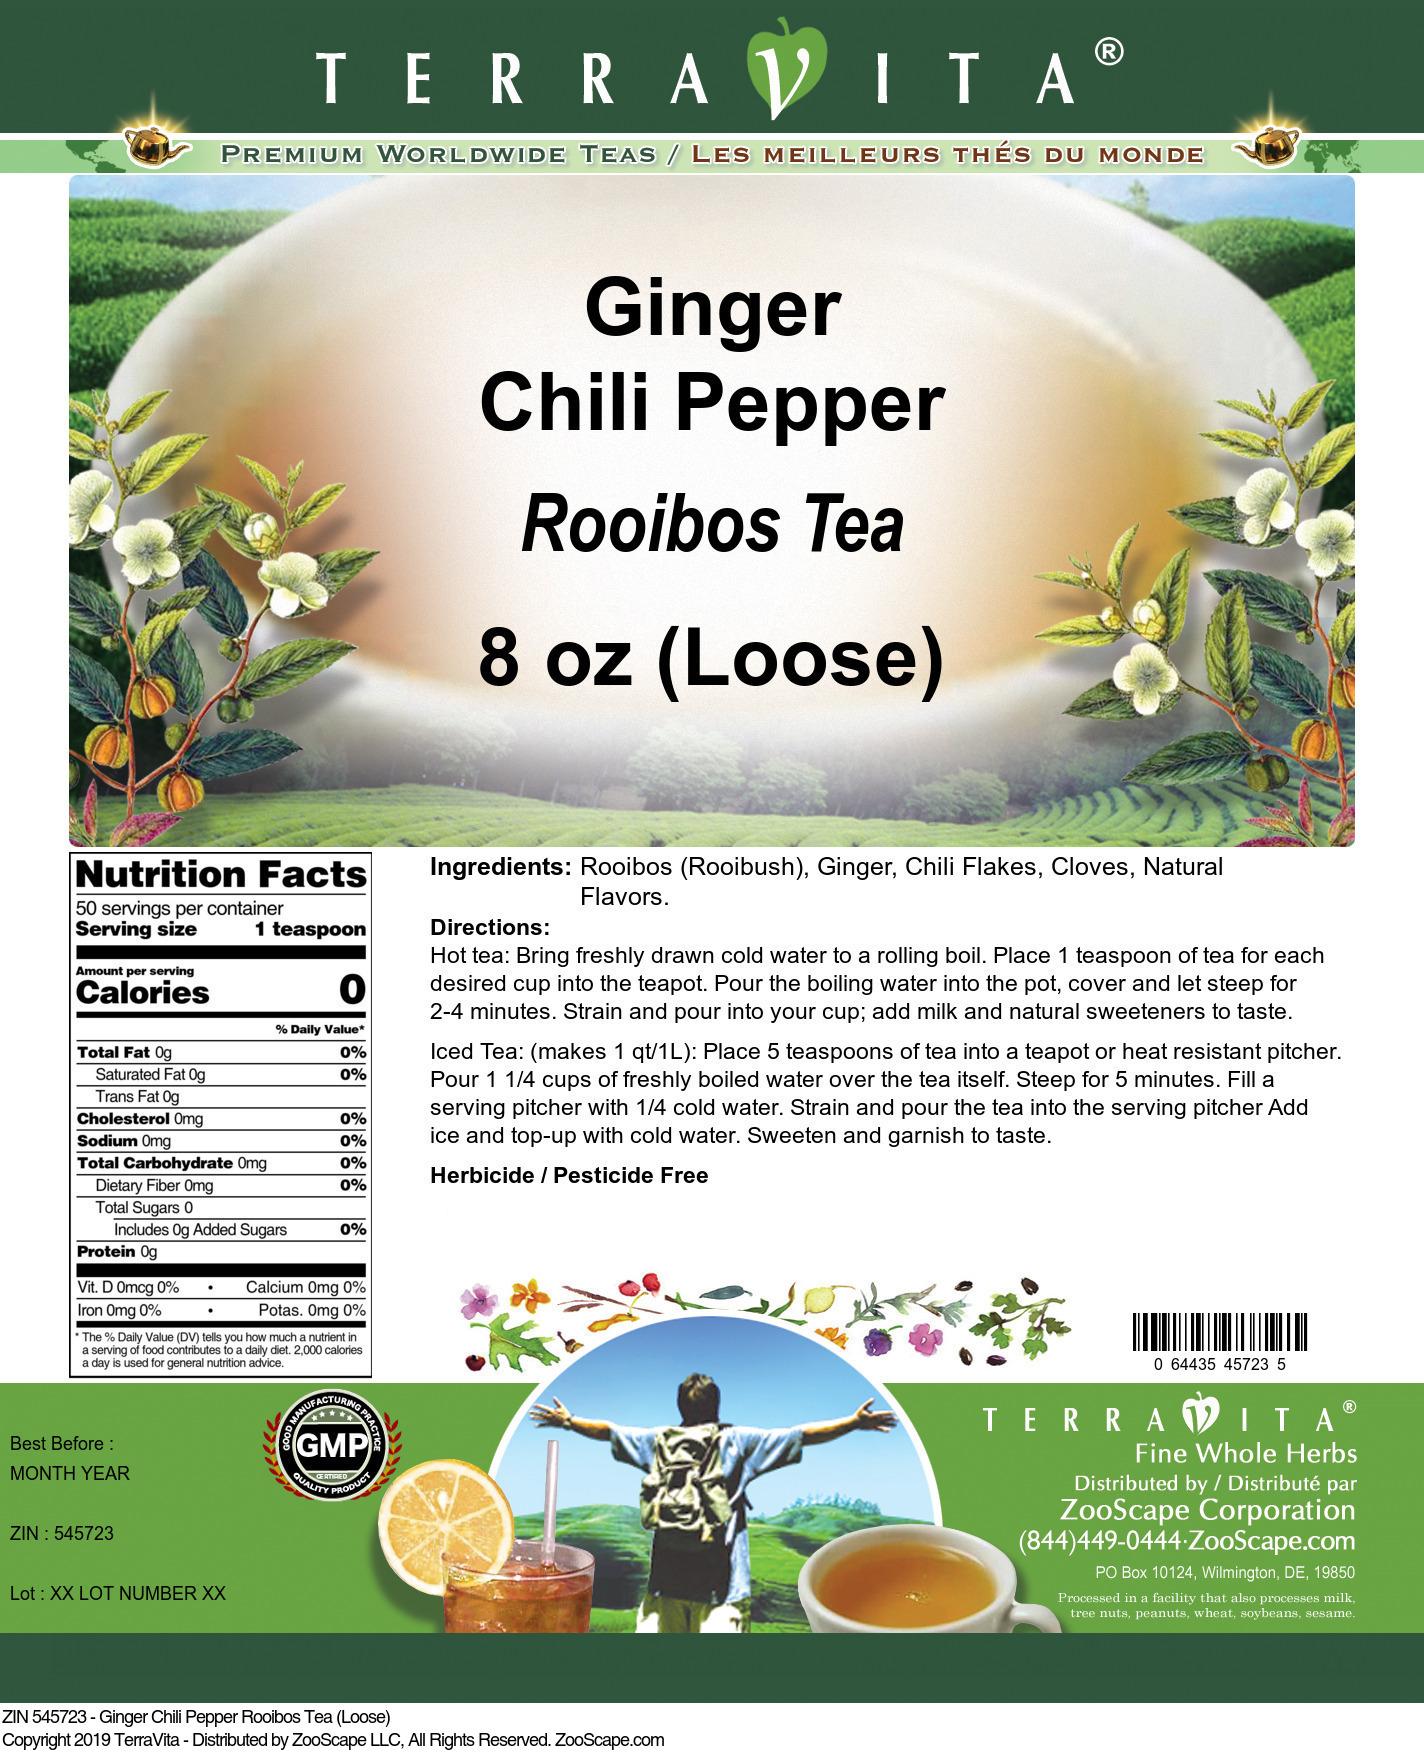 Ginger Chili Pepper Rooibos Tea (Loose)